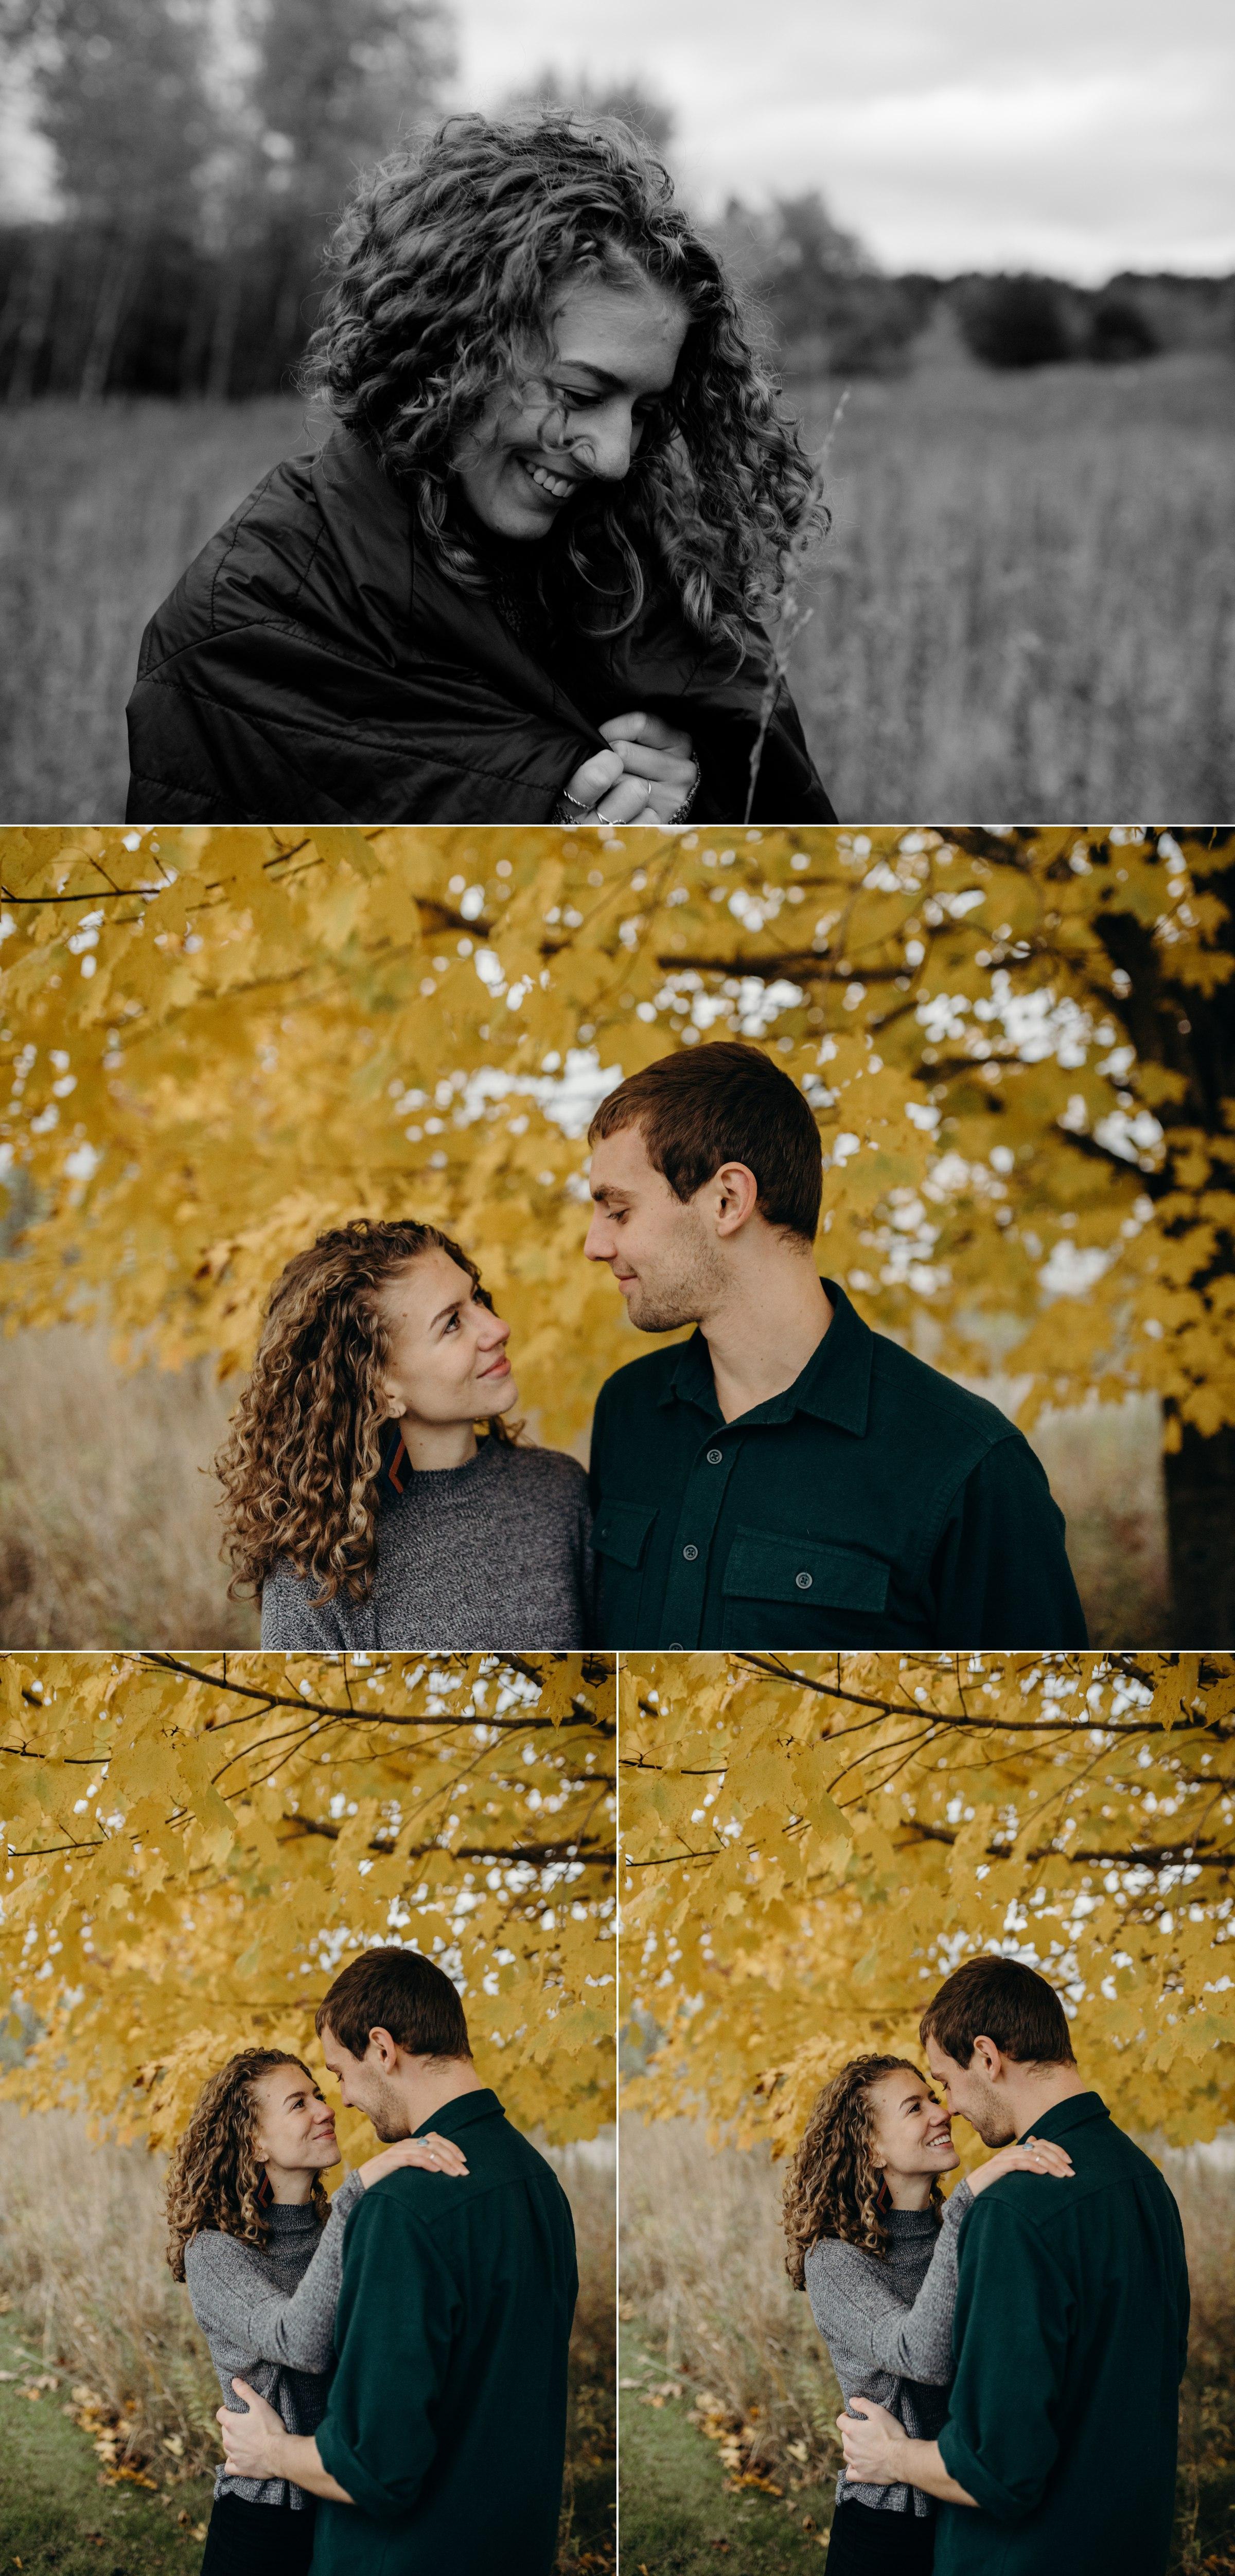 nickmezaphotography-austin-minneapolis-wedding-photographer-elopement-best-intimate-adventurous-destination-texas-minnesota-engagement-jess-dan-spacesaver_0183.jpg